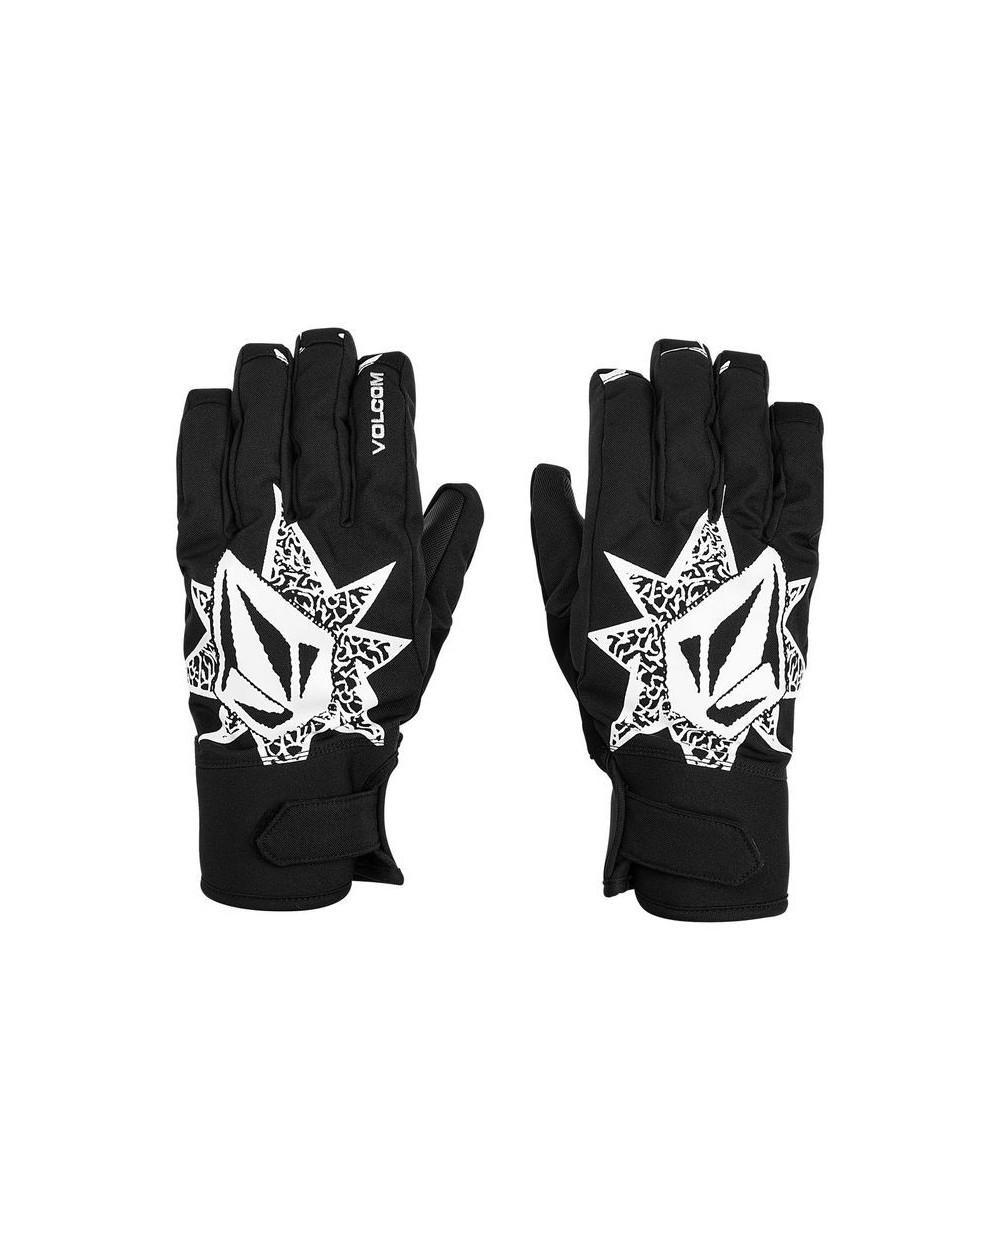 Volcom Snow VCO Nyle Glove - Black